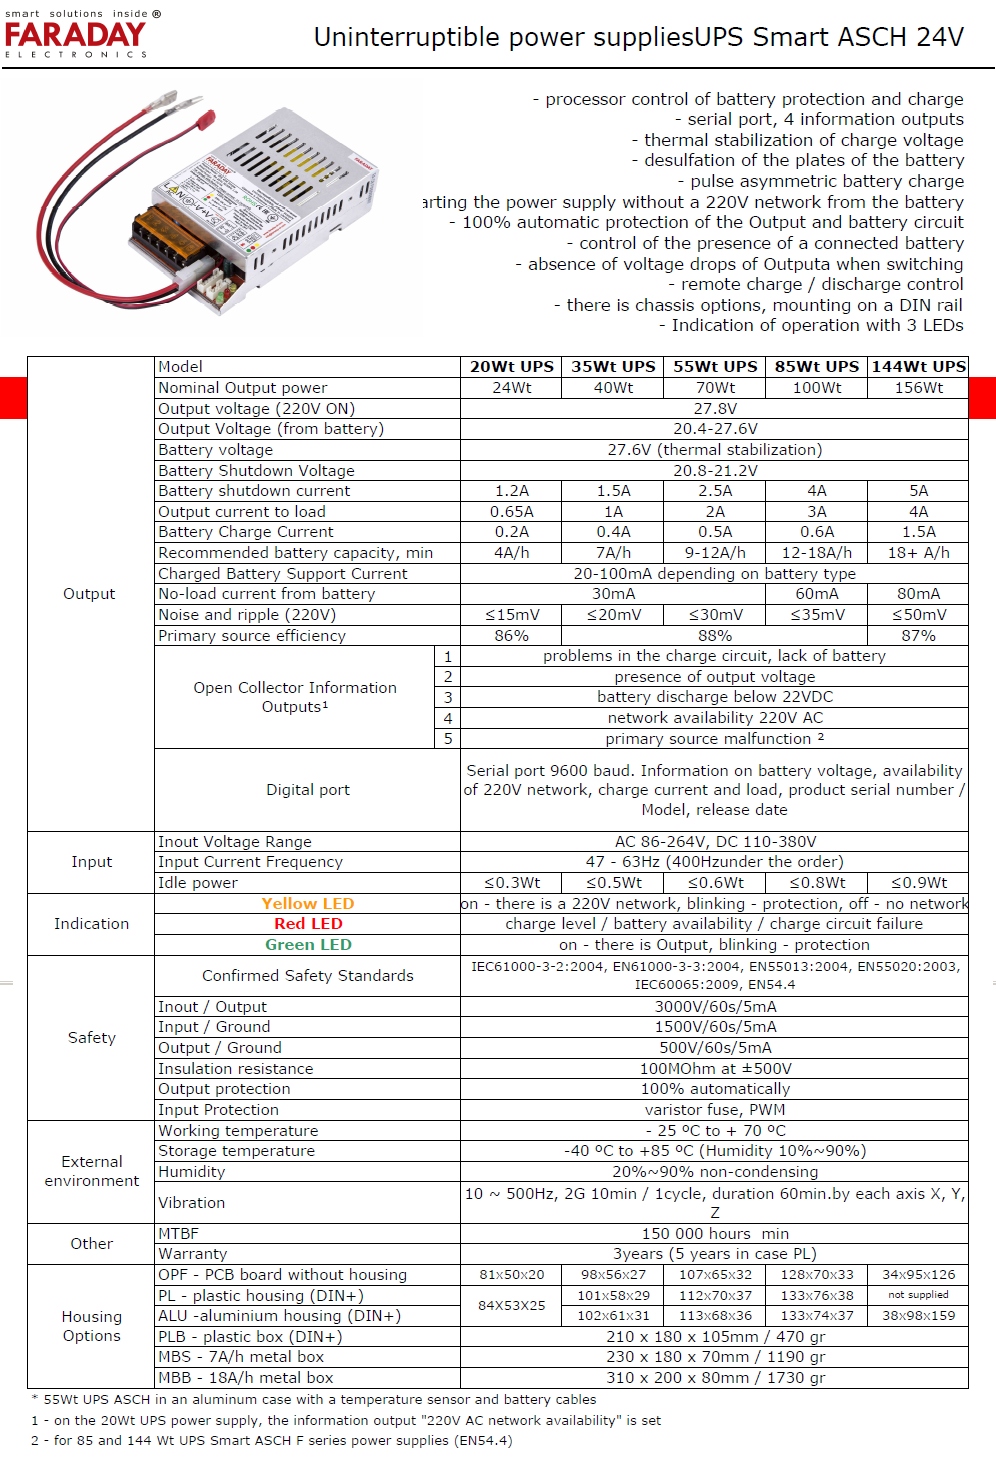 UPS Smart 24V